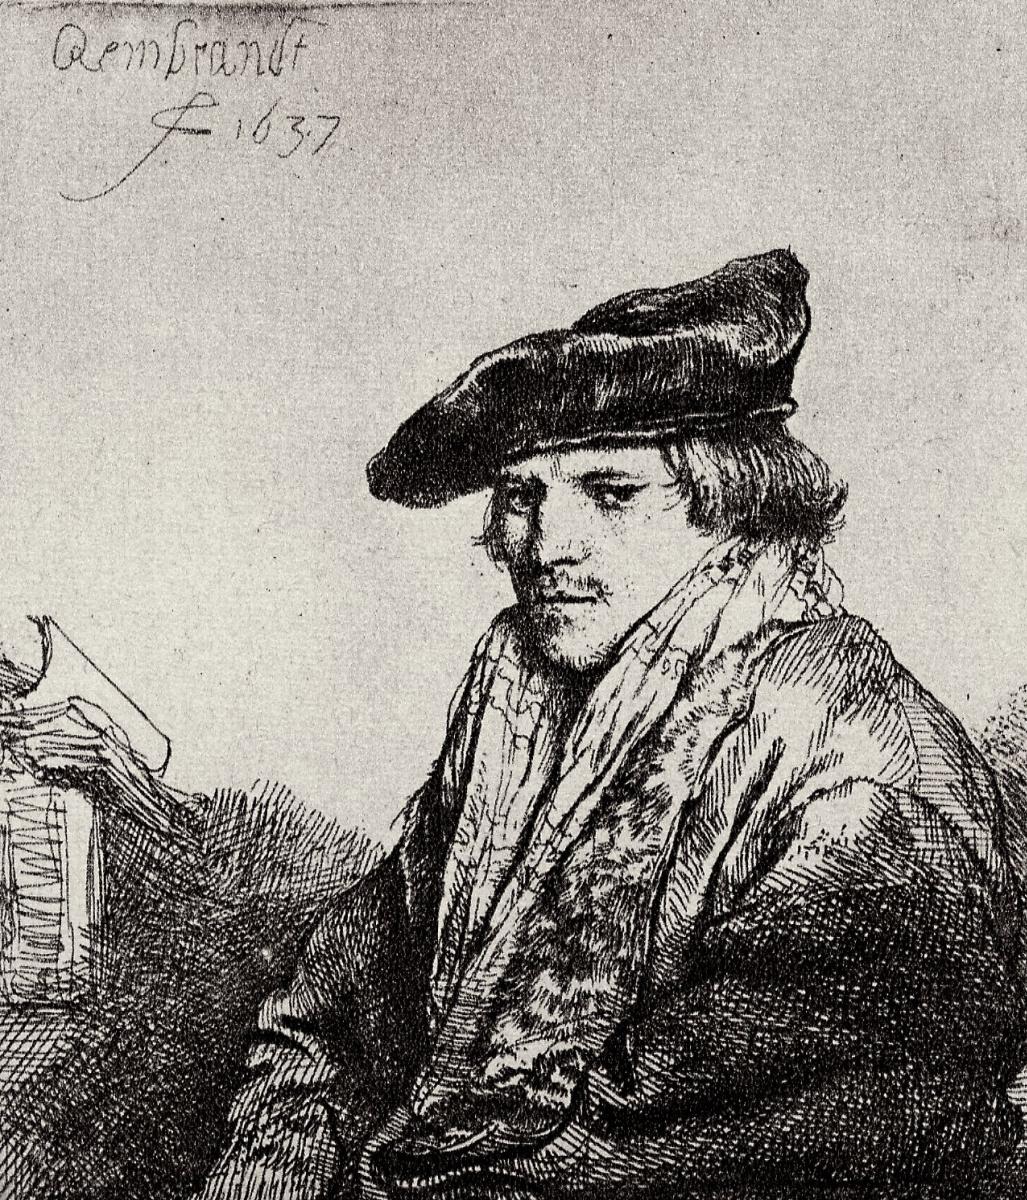 Rembrandt Harmenszoon van Rijn. Portrait of pensive young men